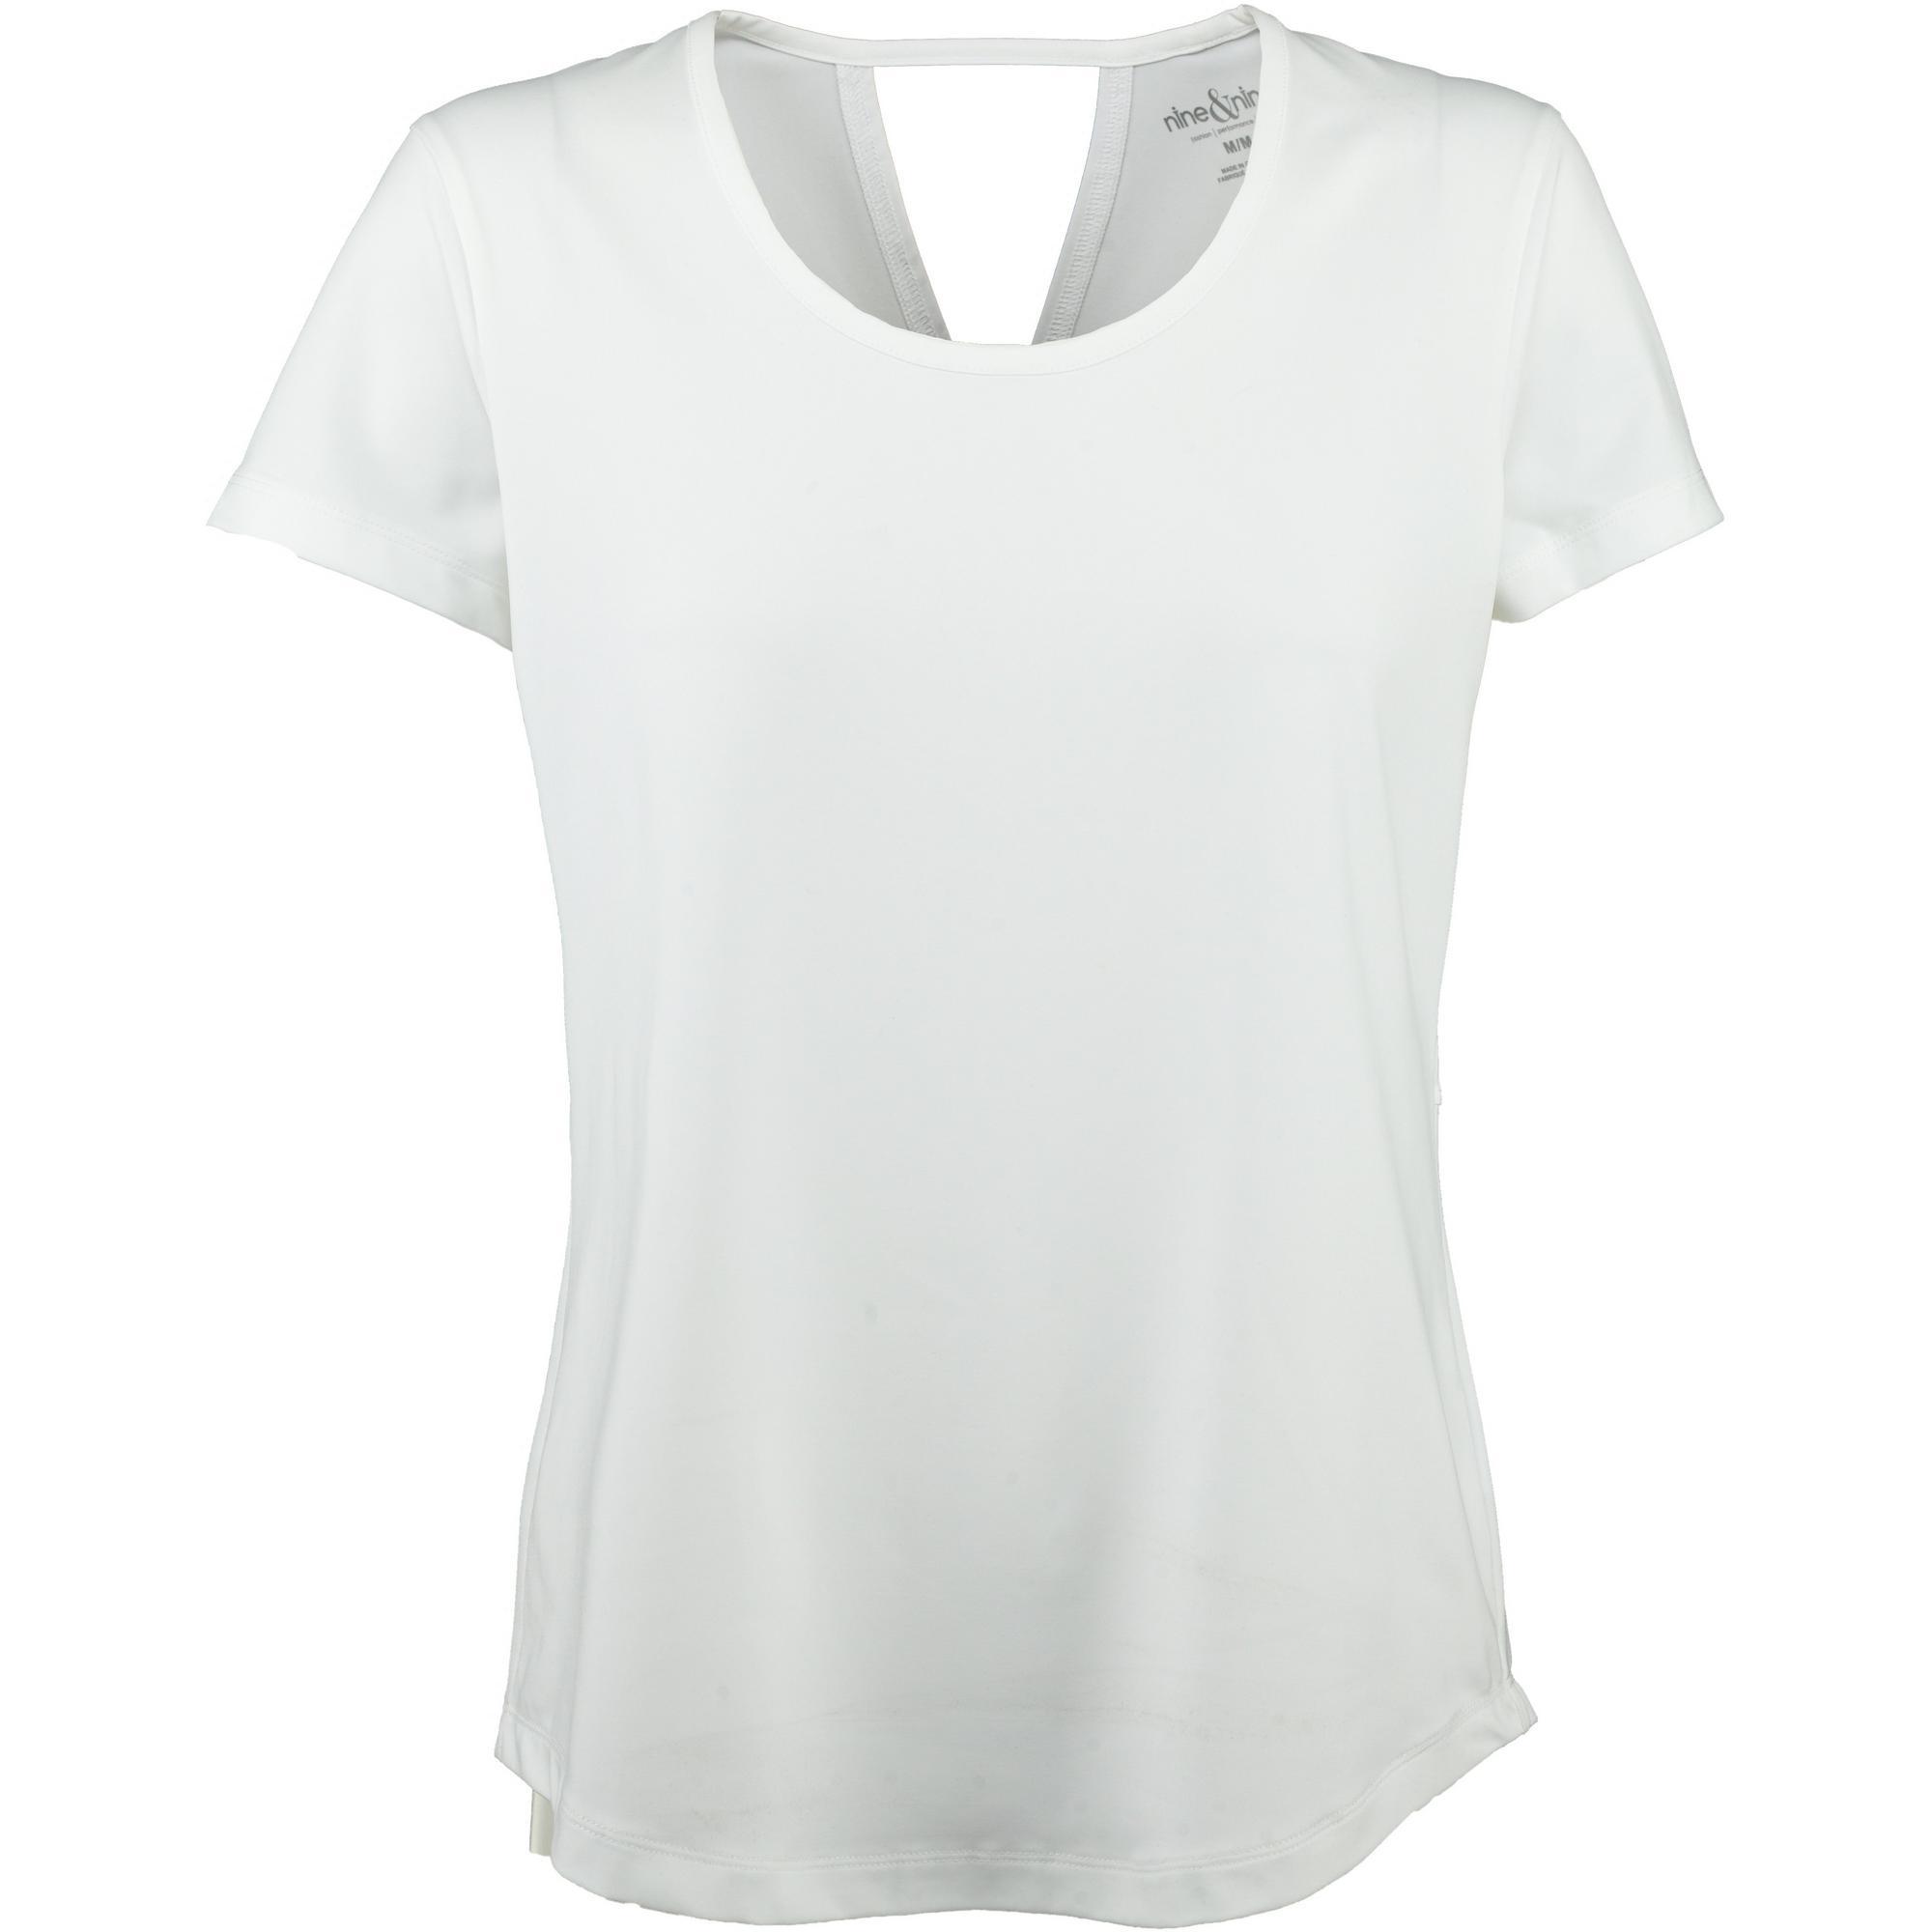 Women's Athletic Short Sleeve Top